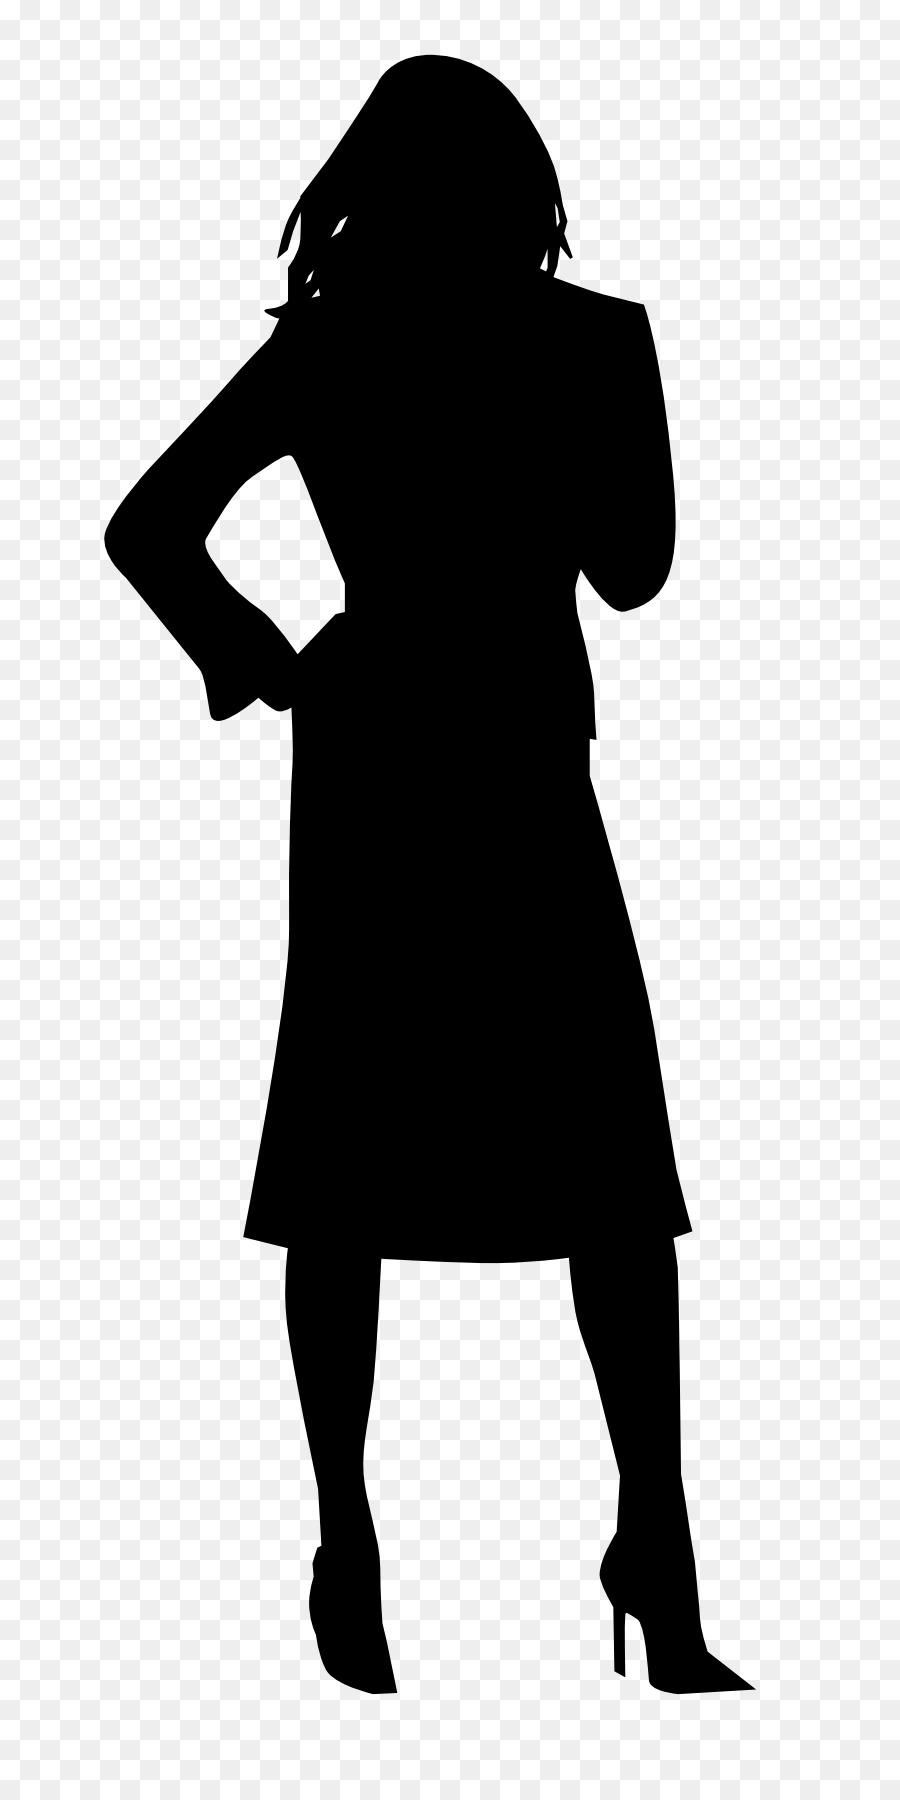 woman silhouette clip art black woman png download 800 1789 rh kisspng com black woman silhouette clip art woman face silhouette clip art